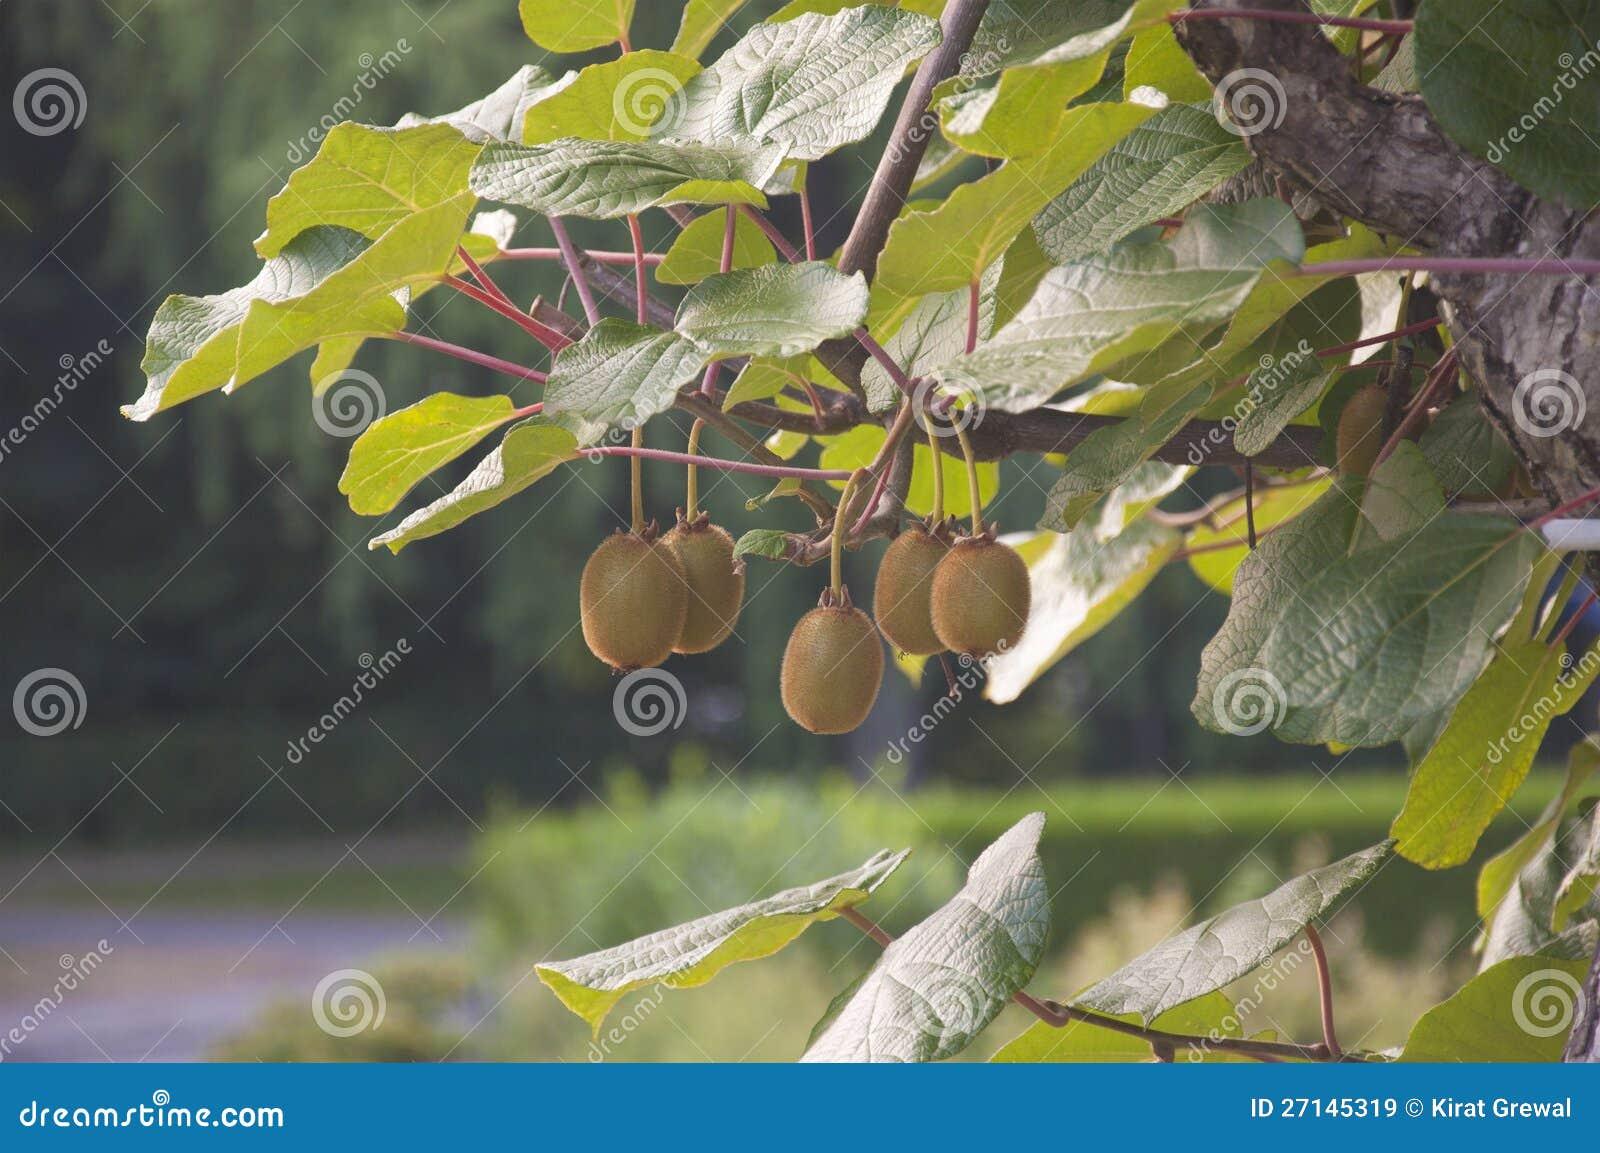 A bunch of kiwis ripening in a garden in Switzerland